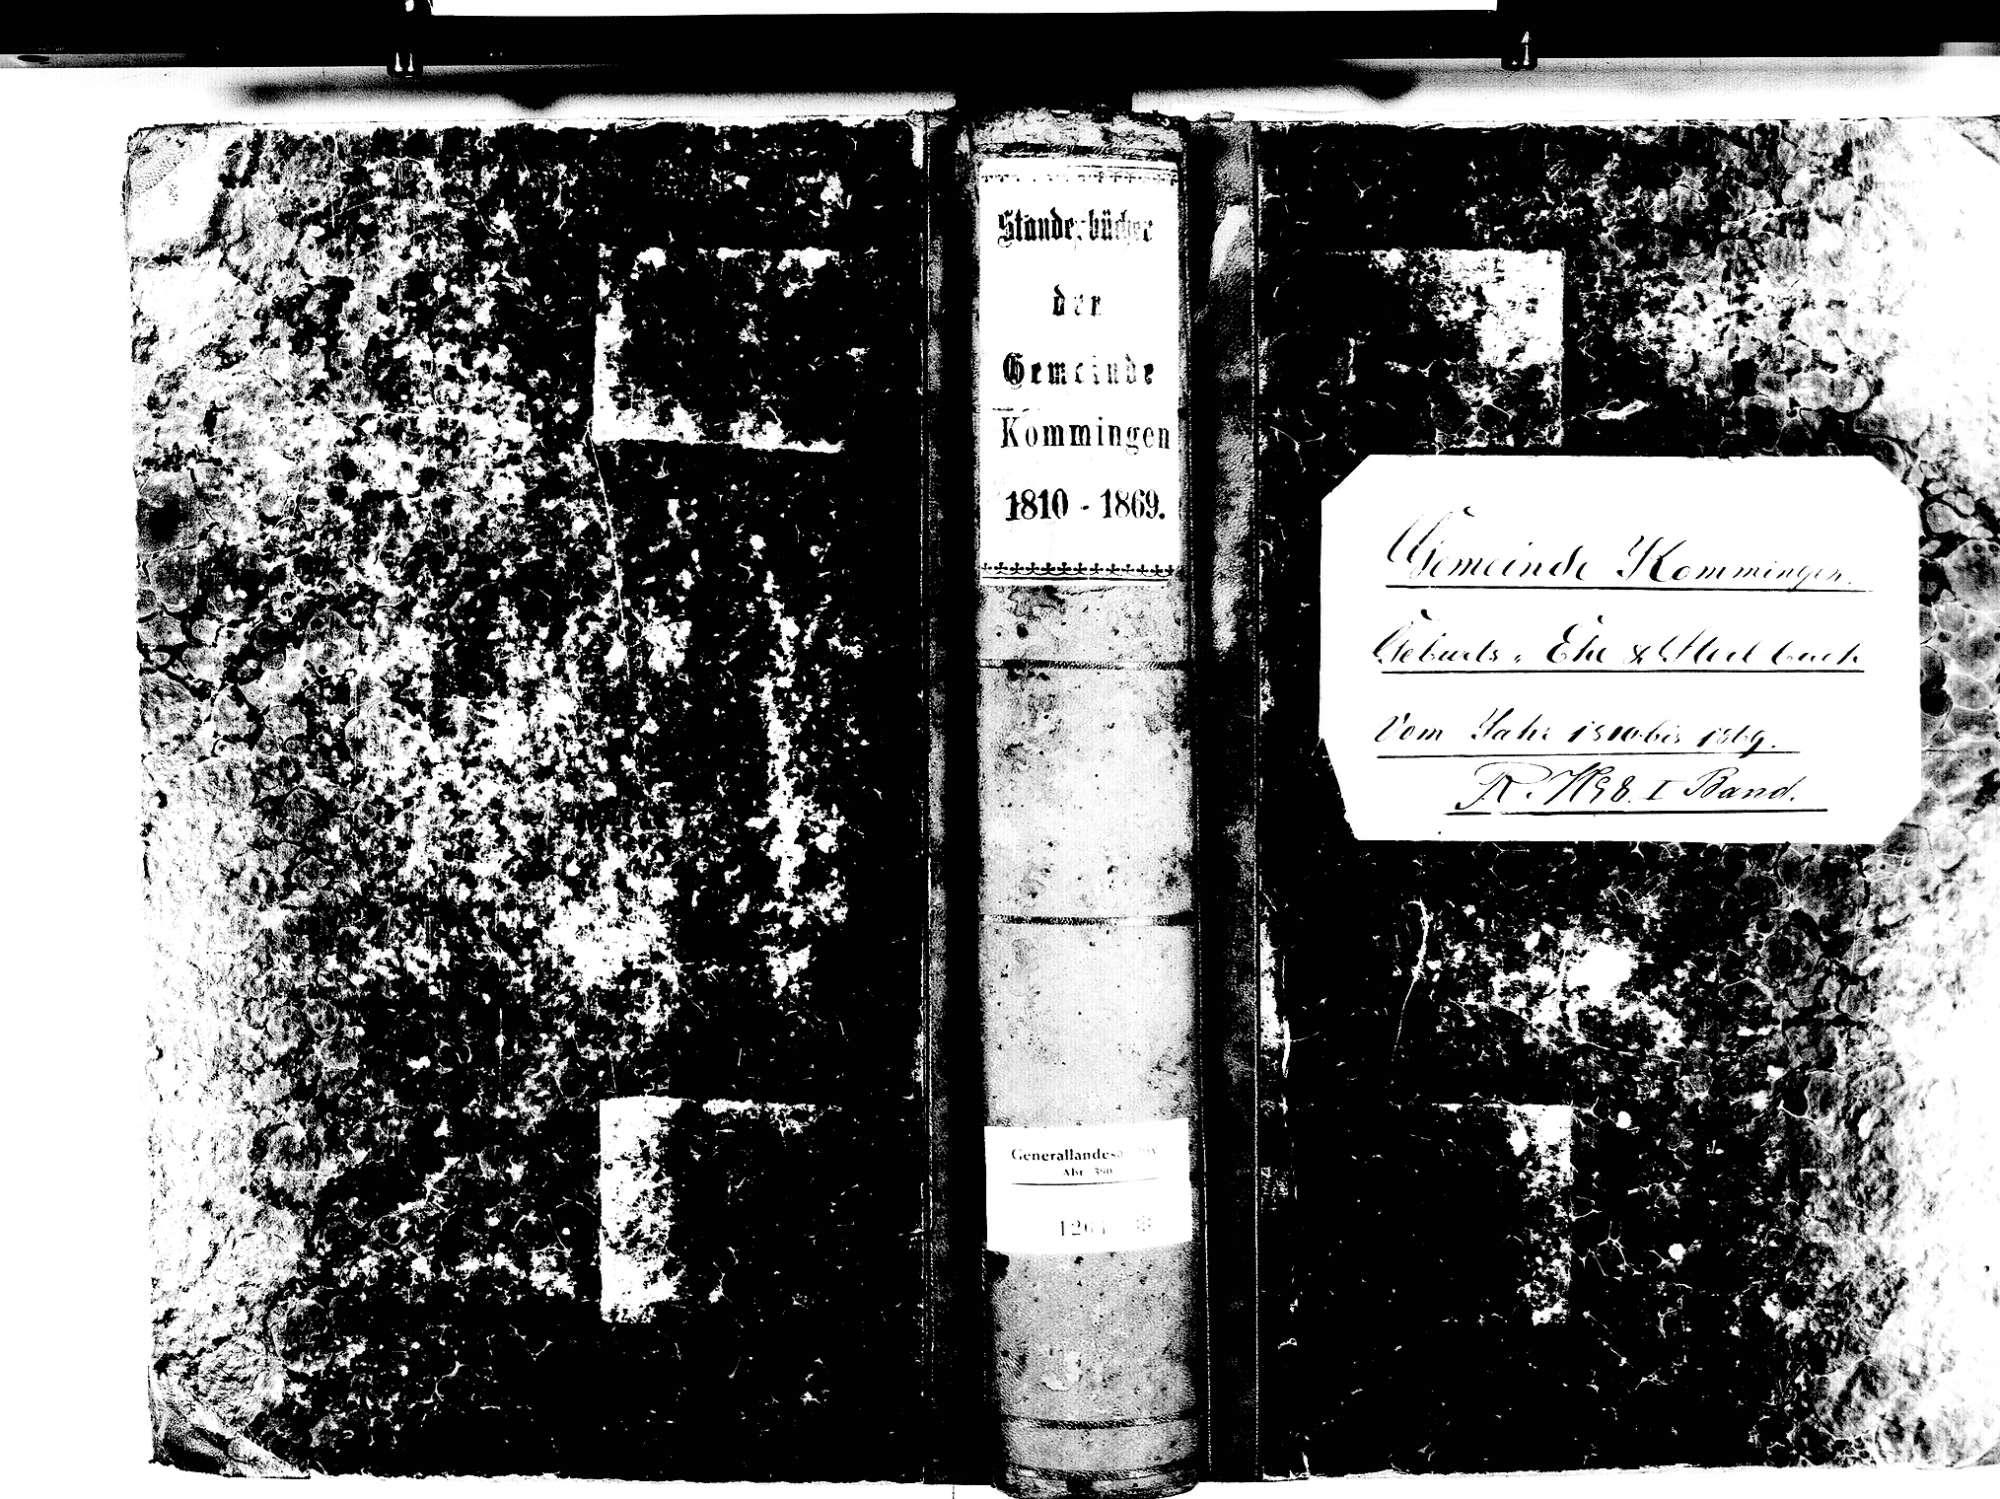 Kommingen, Blumberg VS; Katholische Gemeinde: Standesbuch 1810-1869, Bild 1